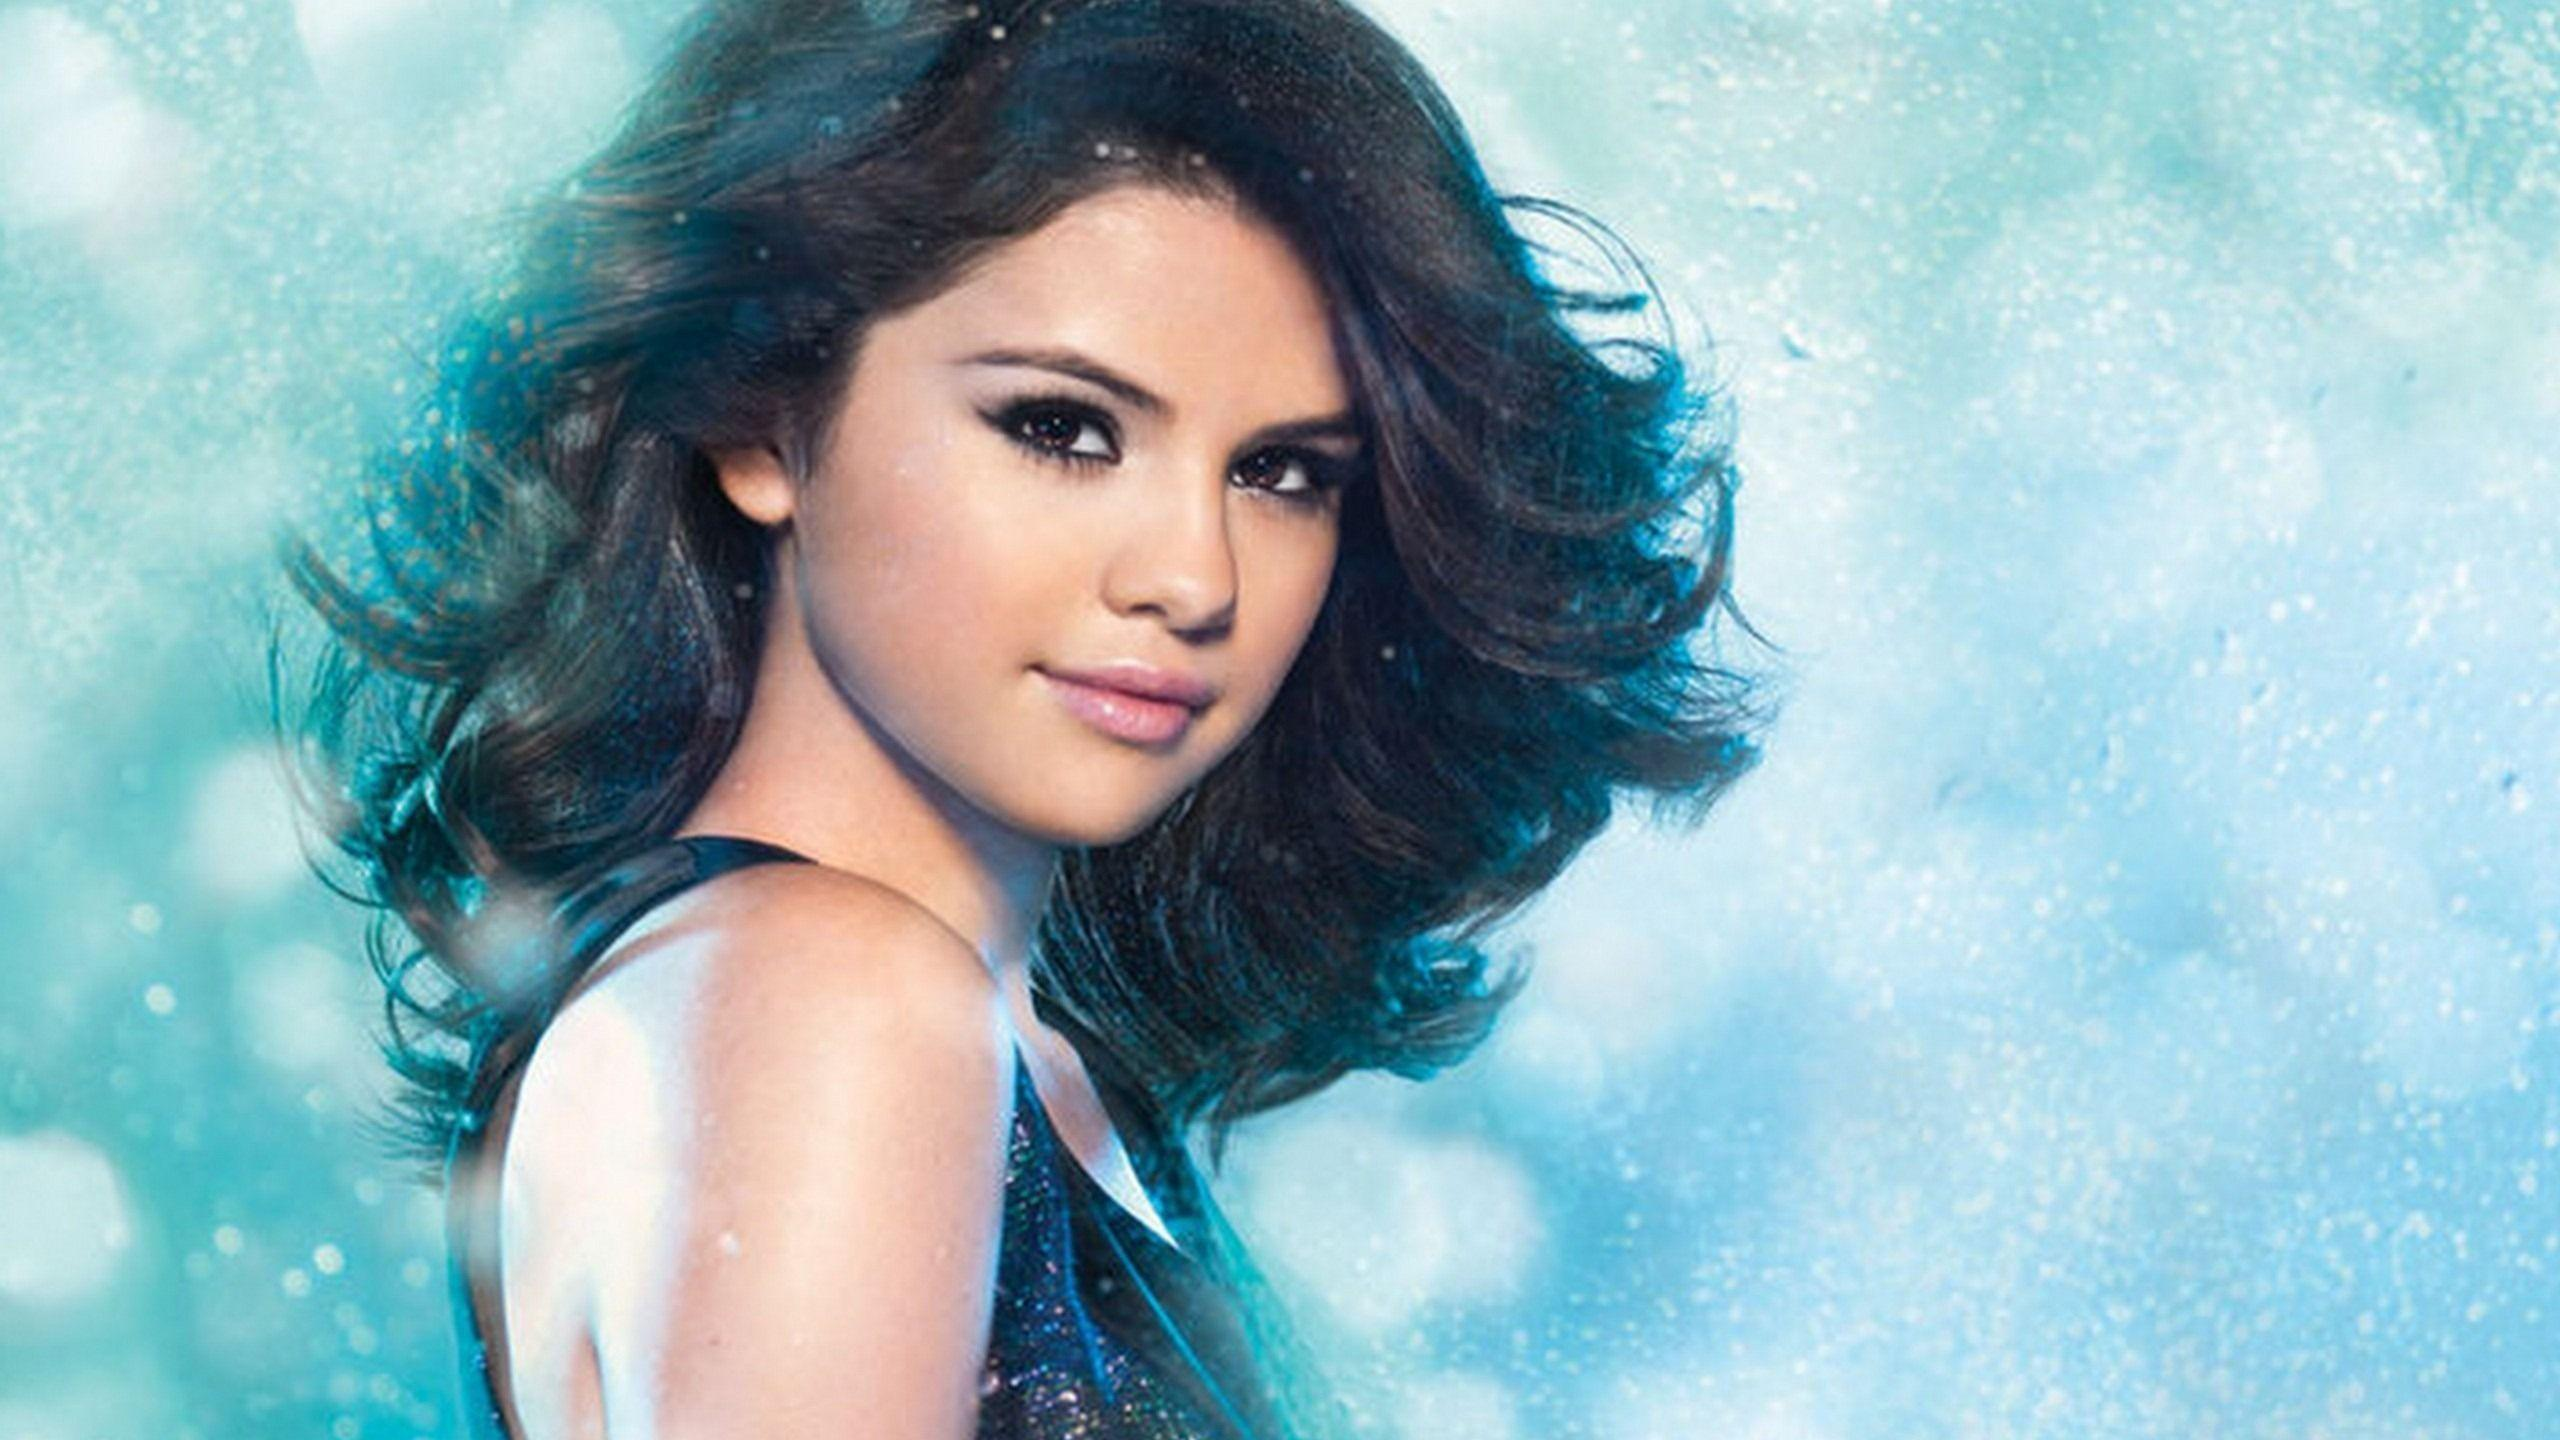 Selena Gomez Desktop Wallpapers Wallpaper Cave